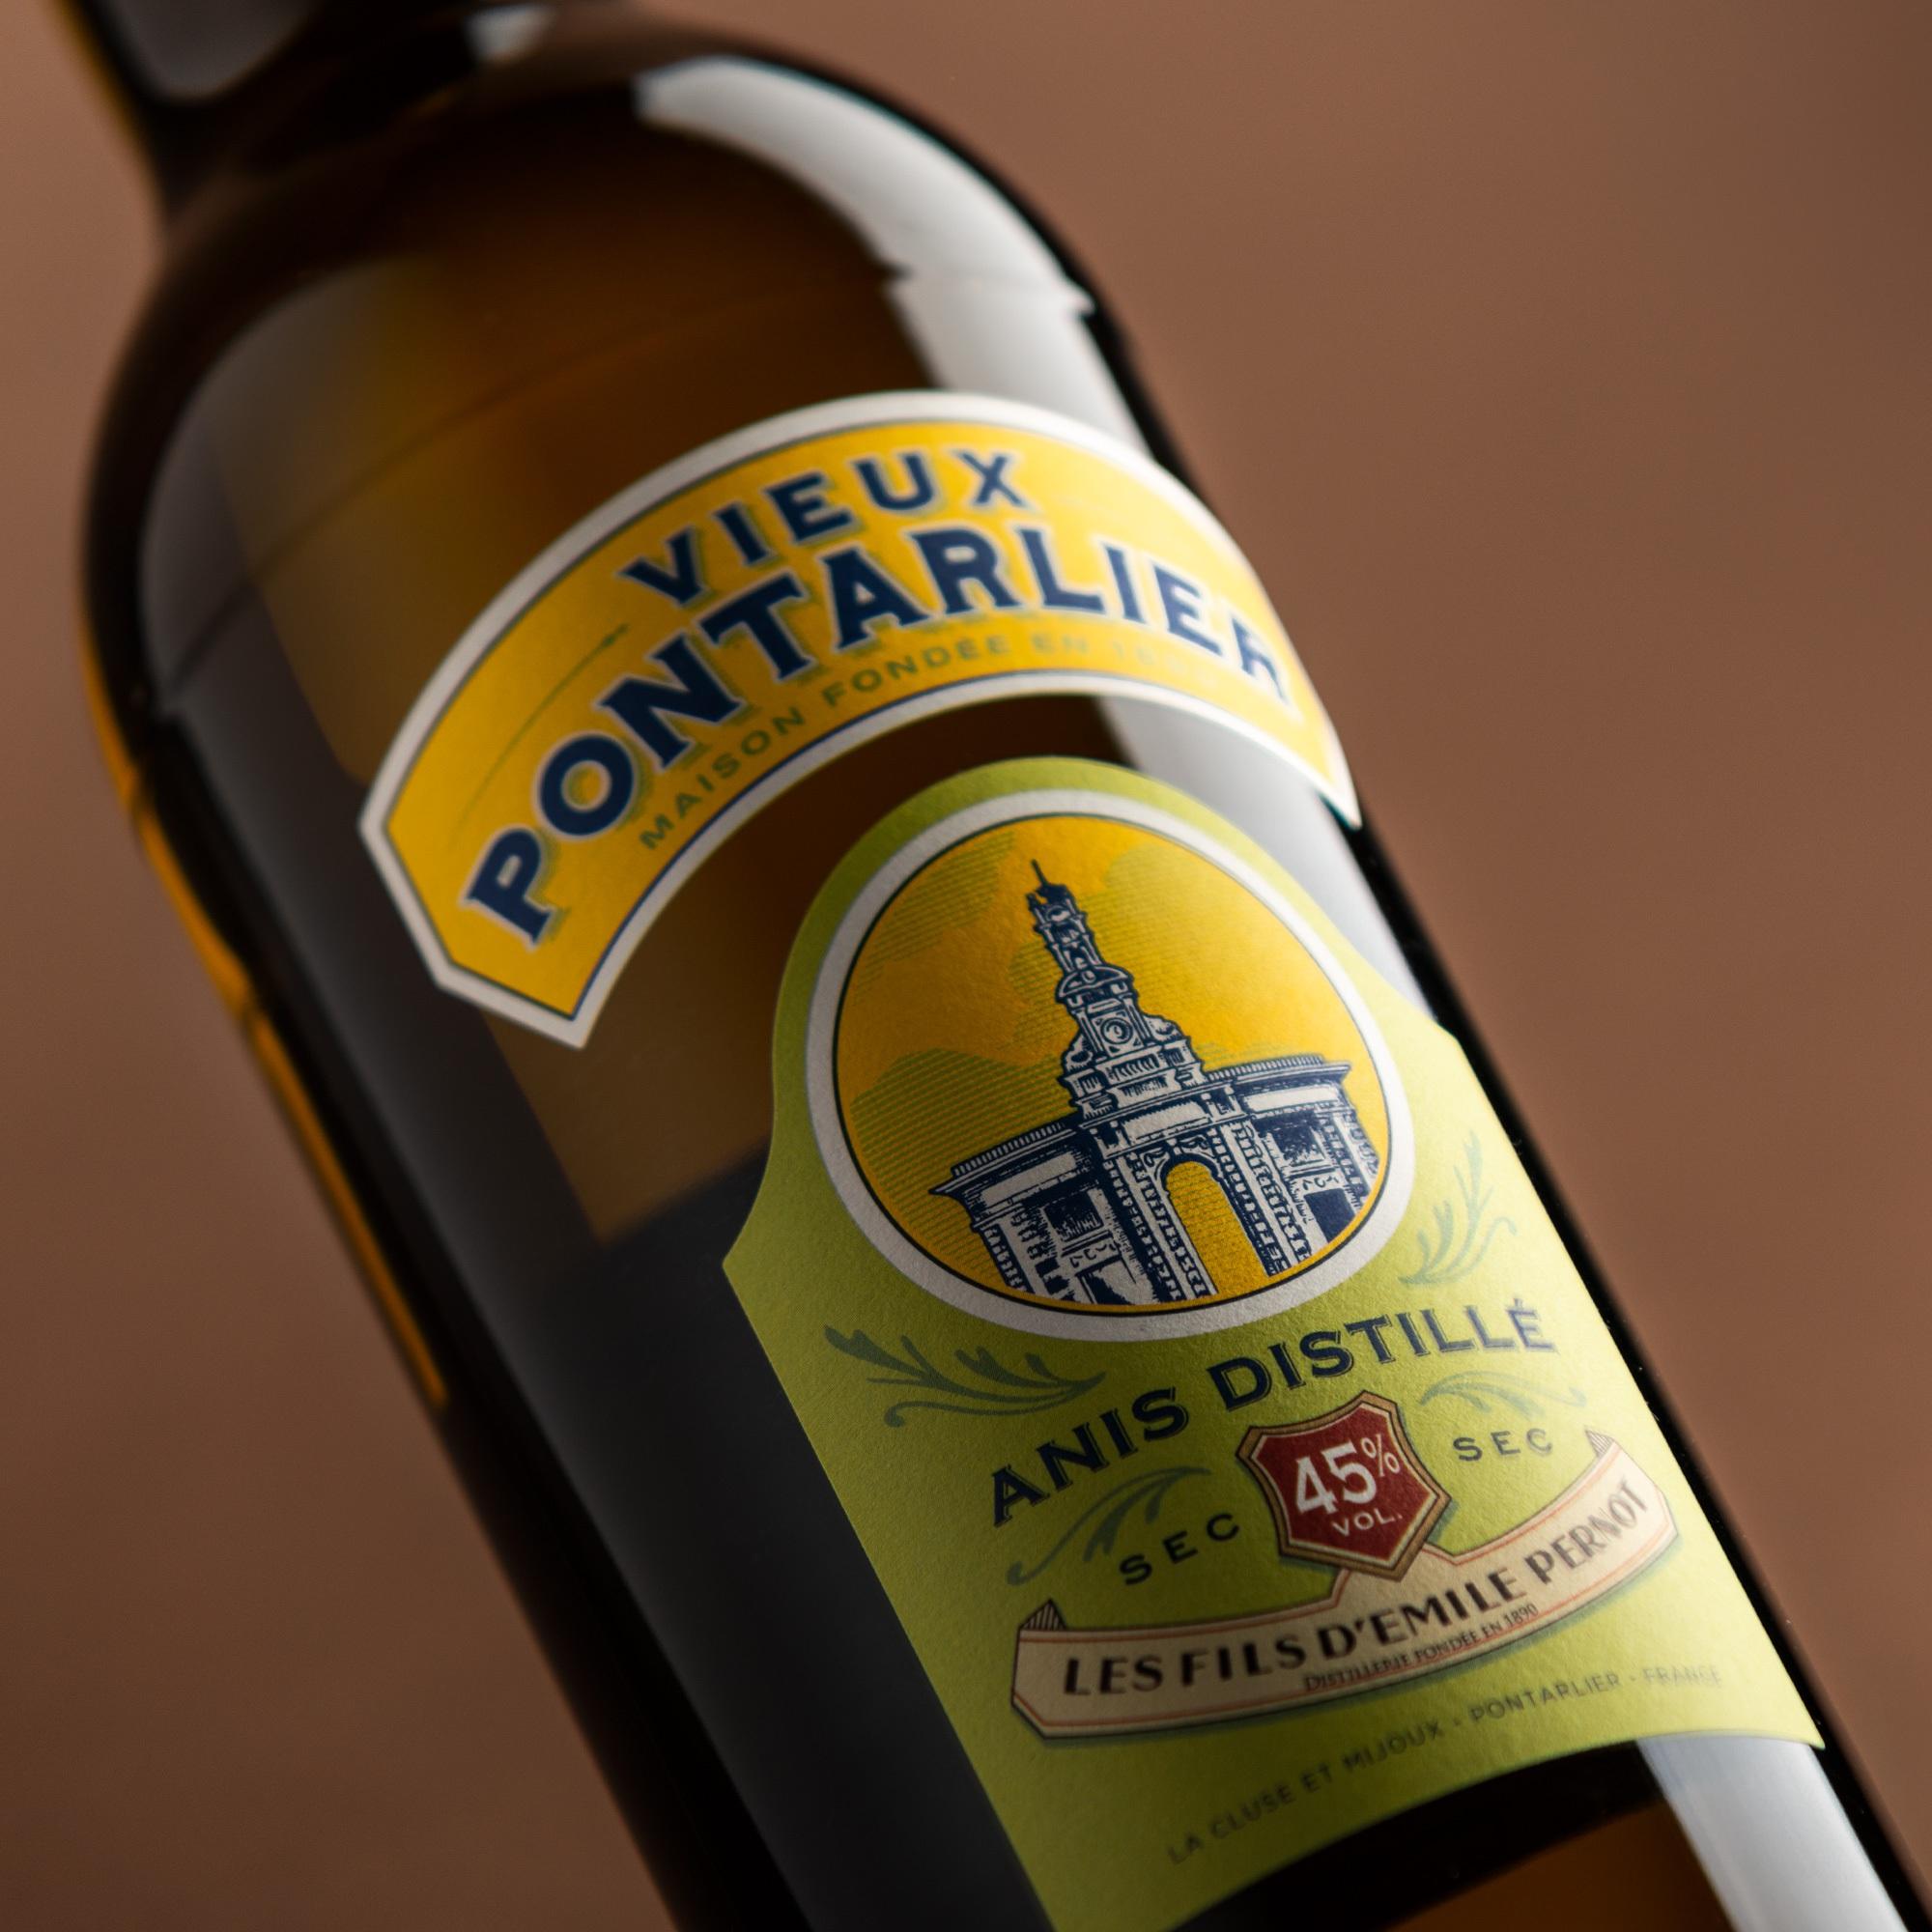 Vieux Pontarlier Anis